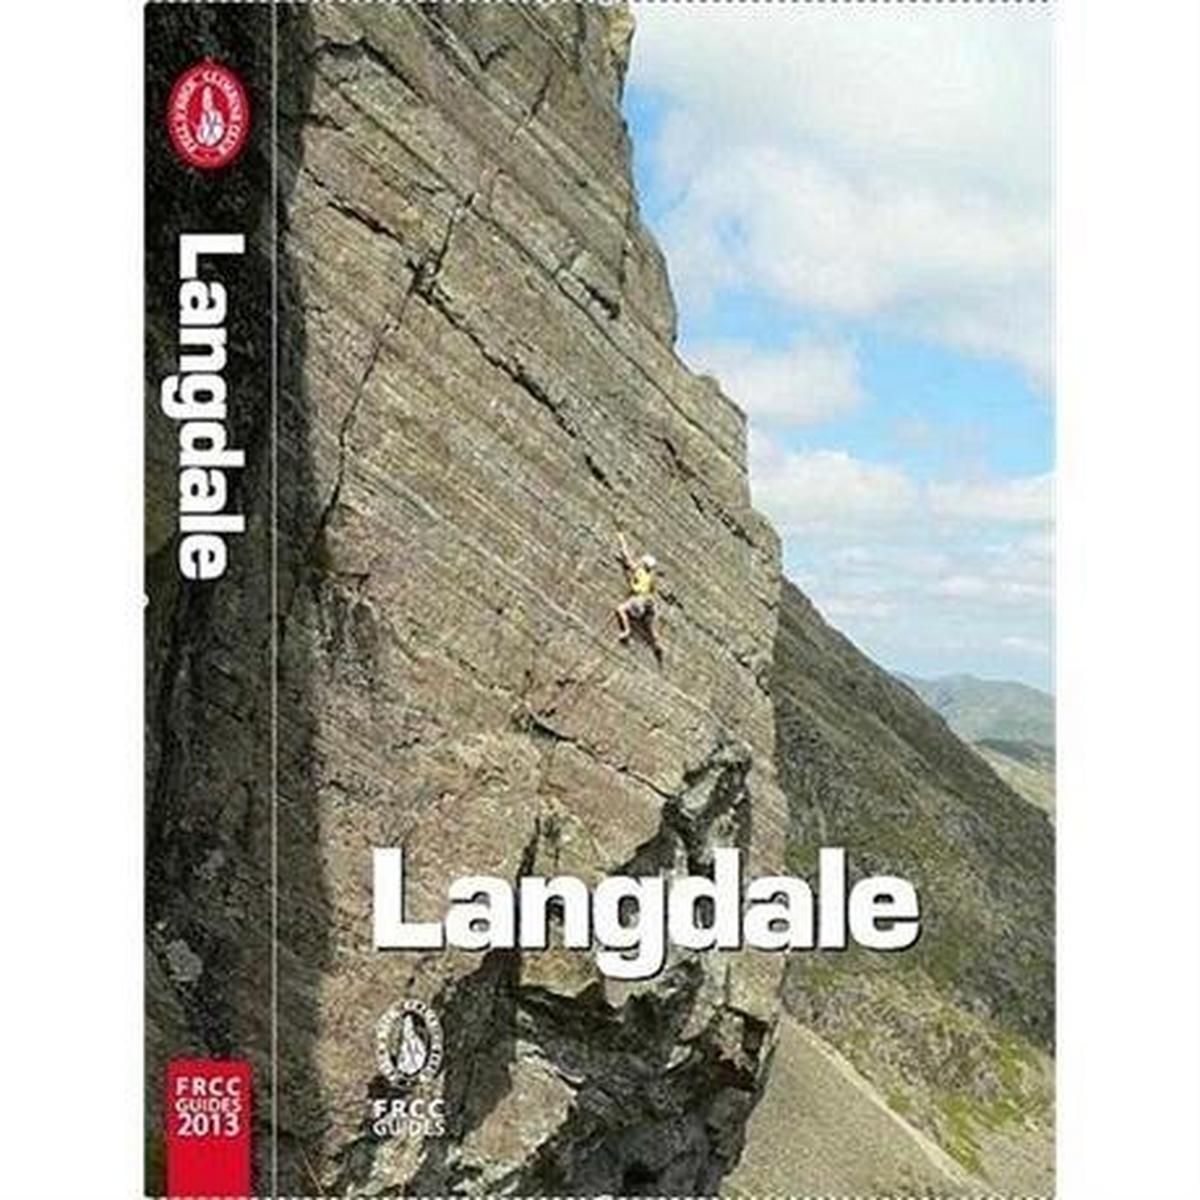 Cordee FRCC Climbing Guide Book: Langdale